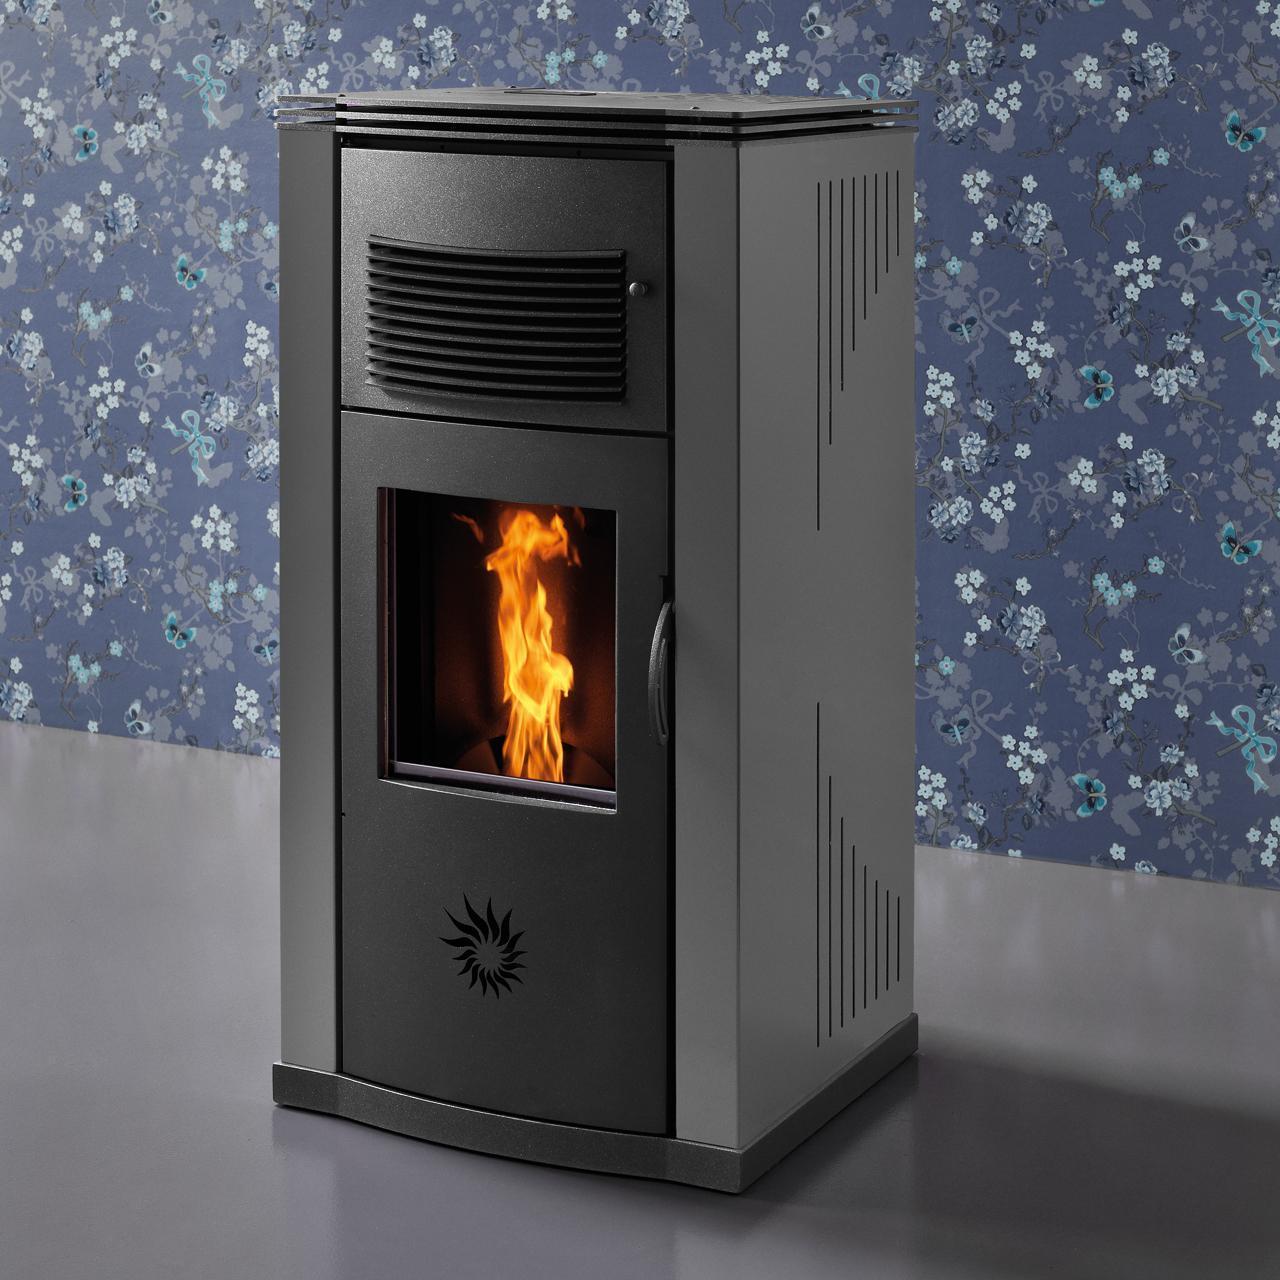 cs thermos pellets et biomasse flori 90 matagne hody. Black Bedroom Furniture Sets. Home Design Ideas